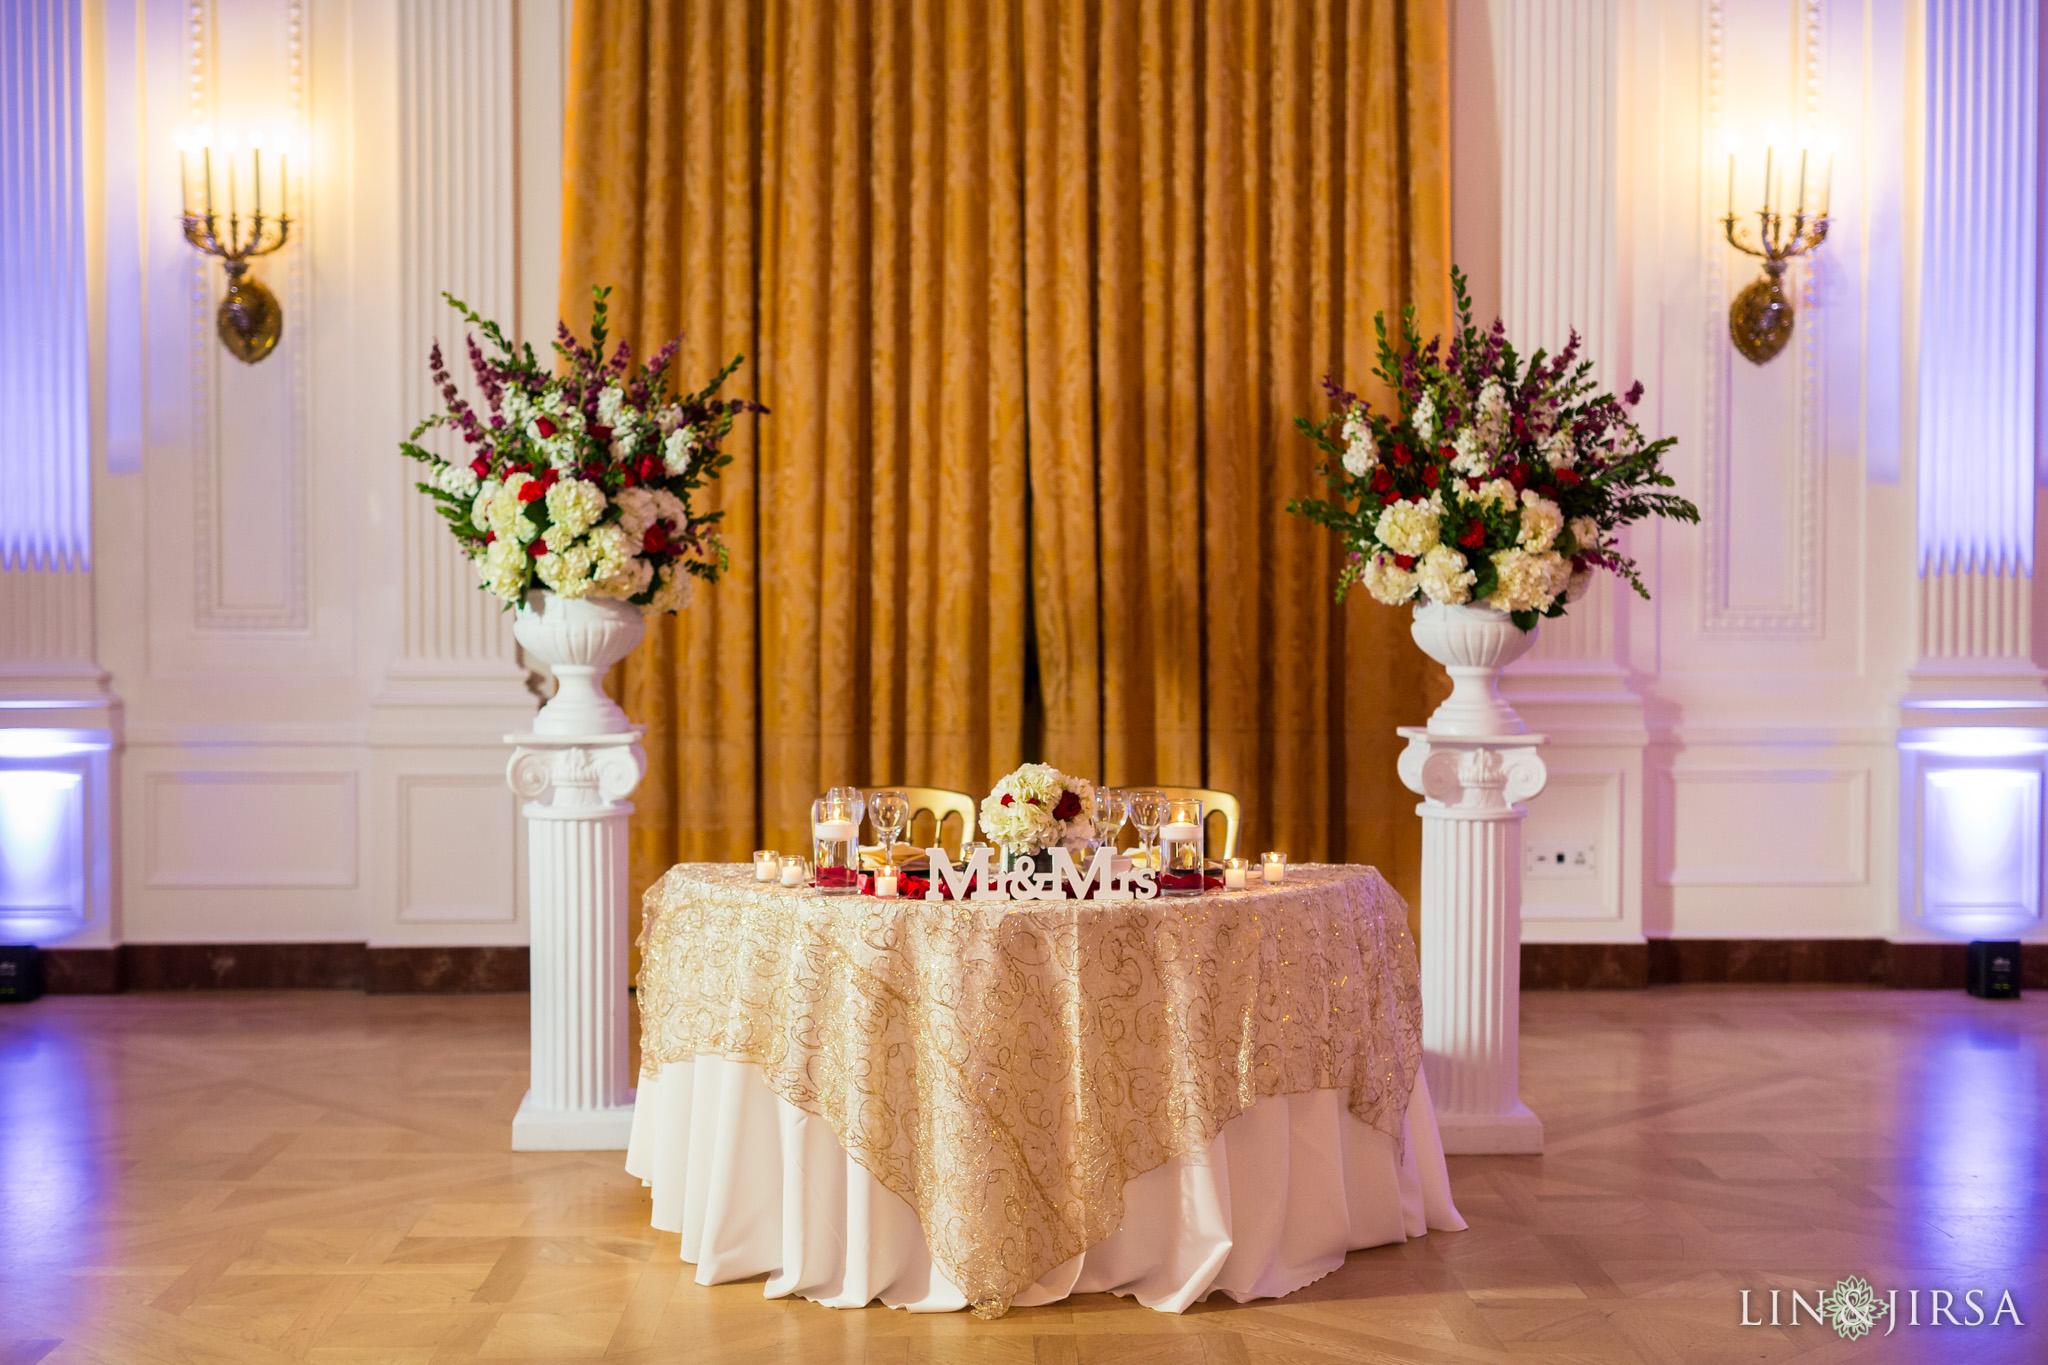 27-Nixon-presidential-library-wedding-photographer